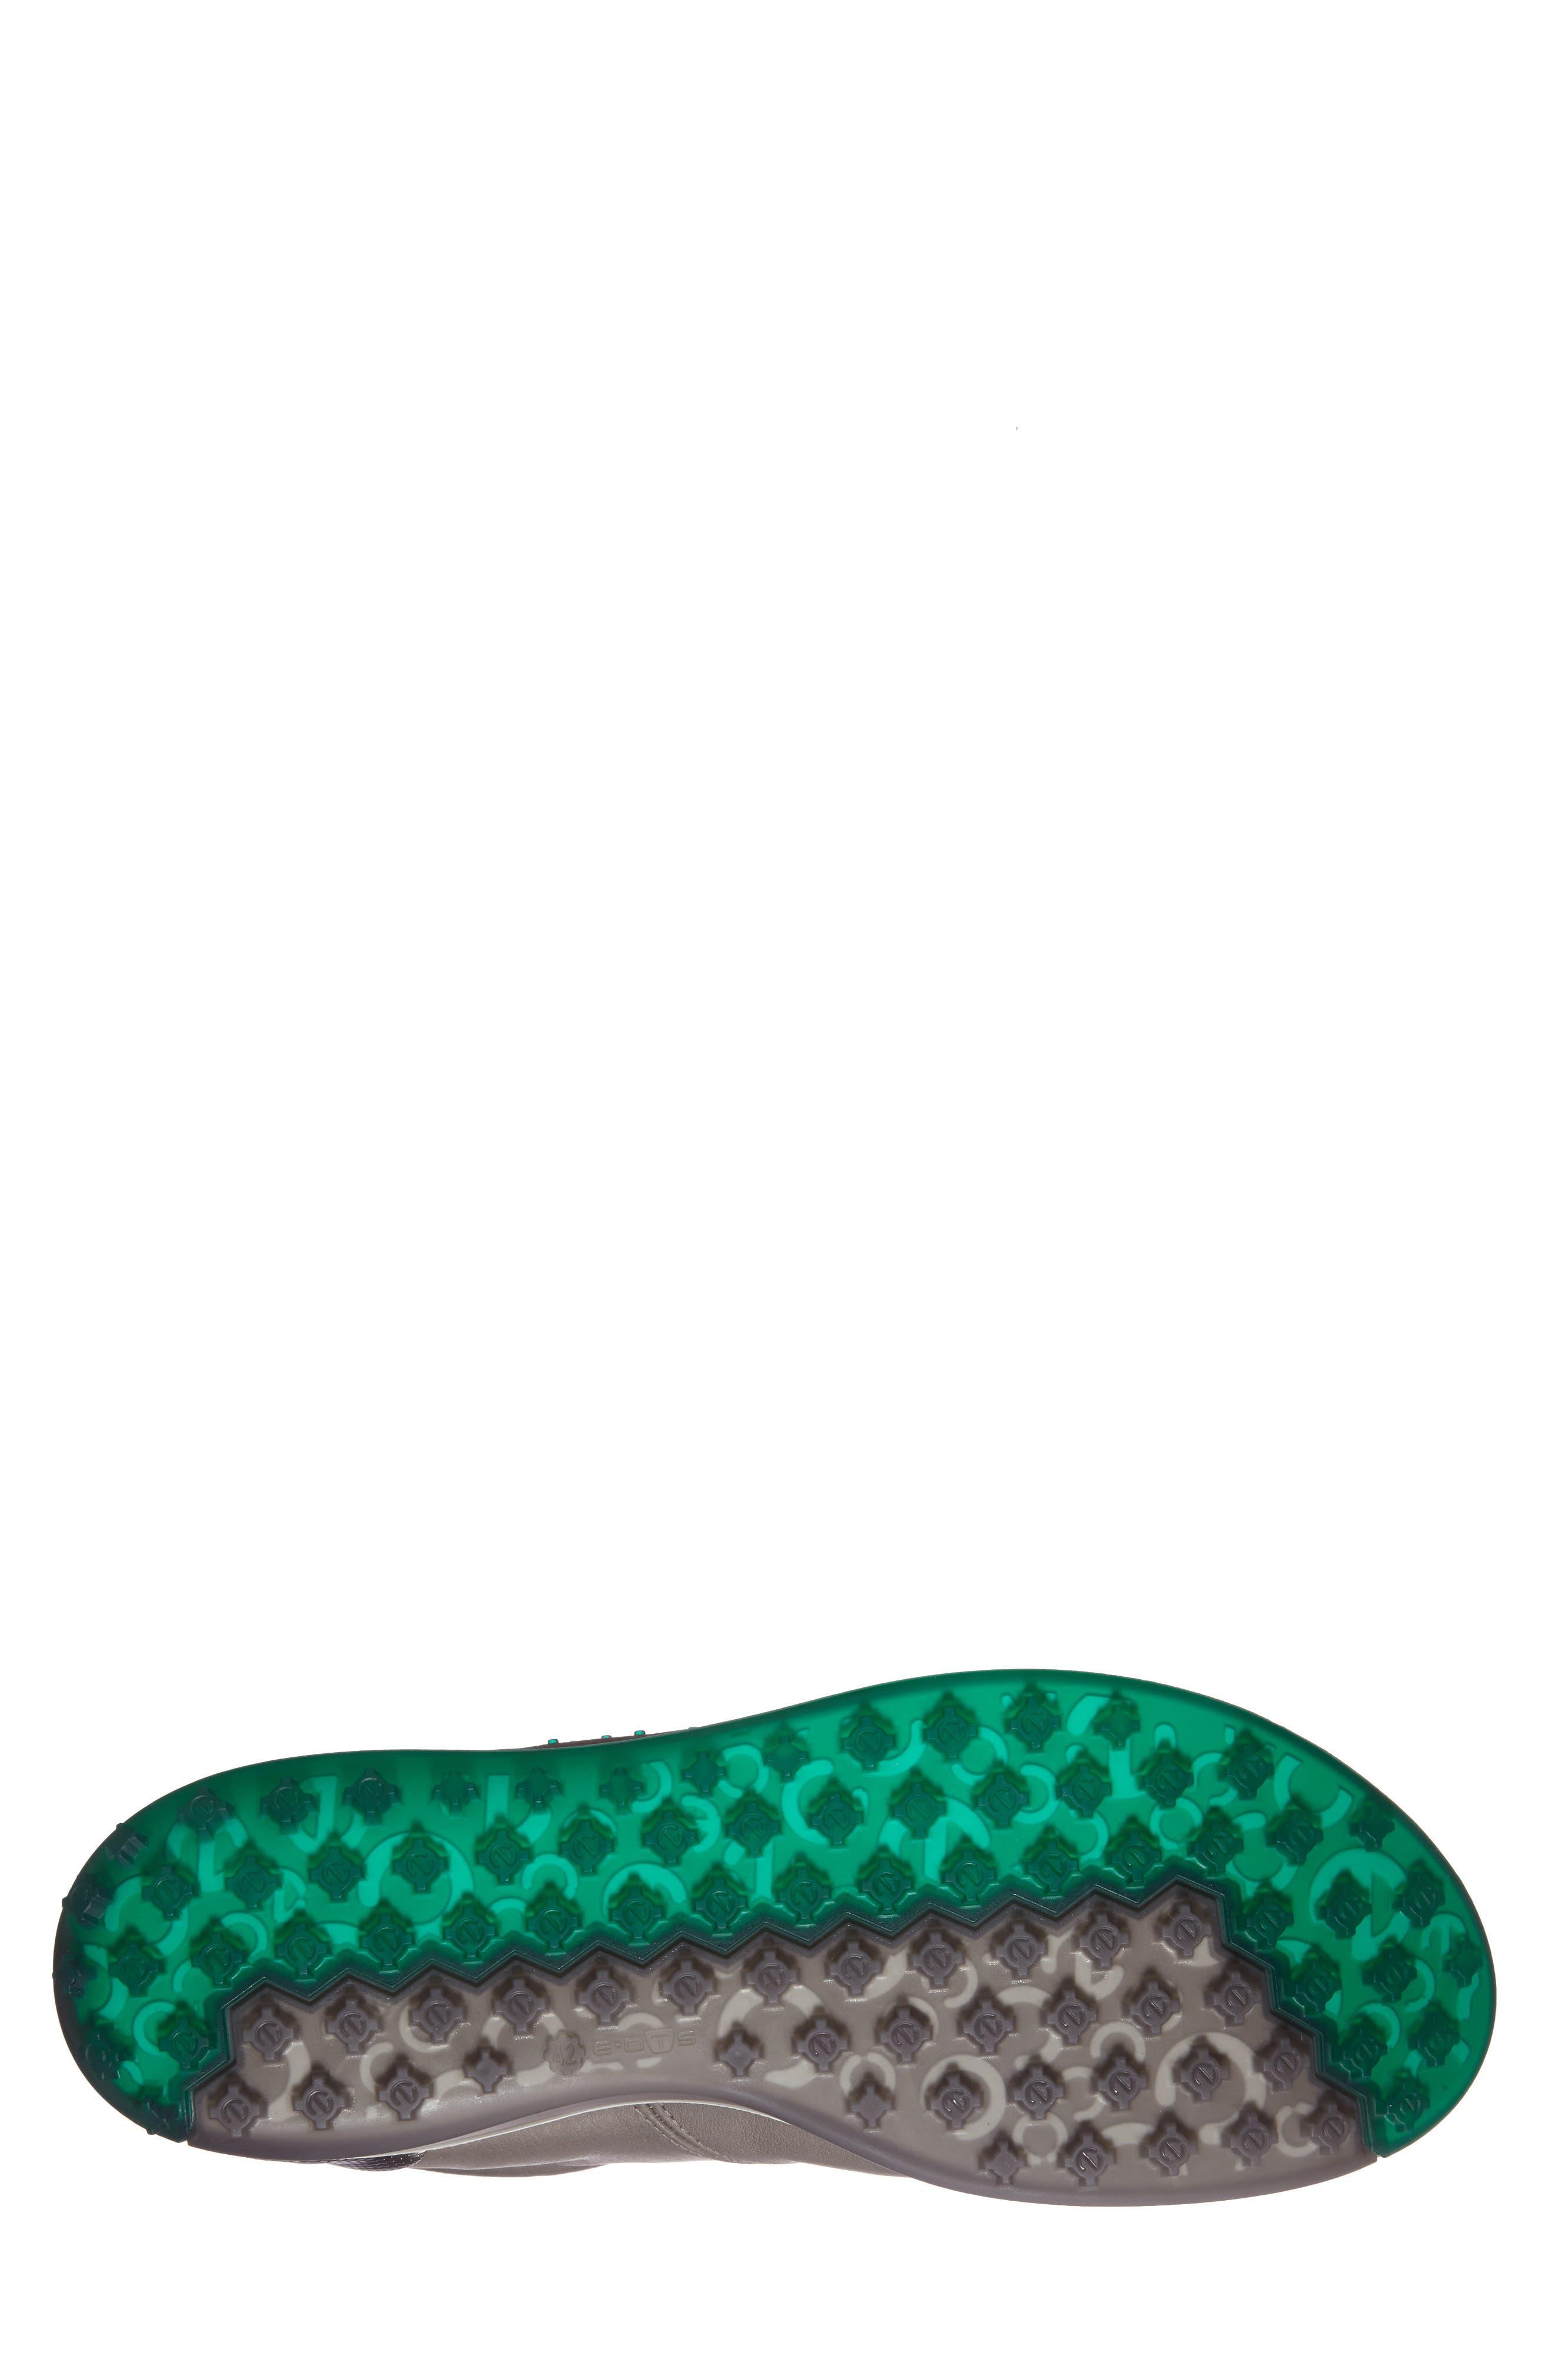 BIOM Hybrid 2 Golf Shoe,                             Alternate thumbnail 5, color,                             WARM GREY/ GREEN